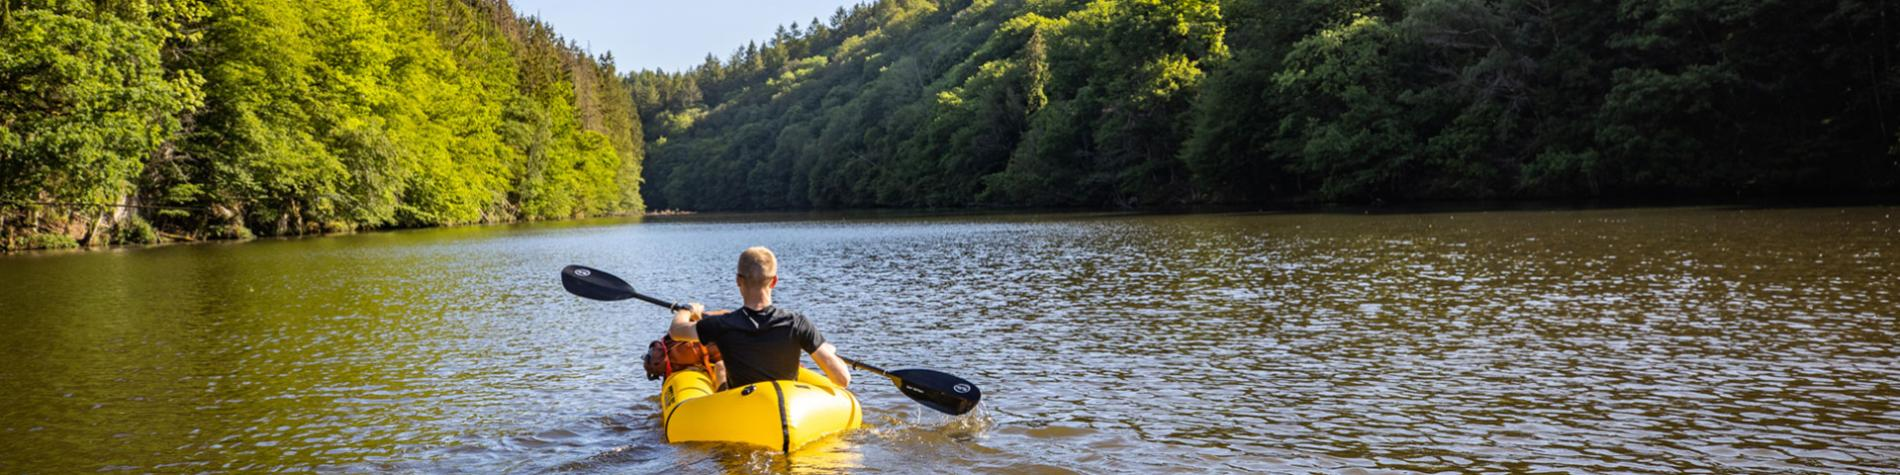 Campagne - relance - VisitWallonia - Changer d'air - Kayak - Packraft - lac de Nisramont